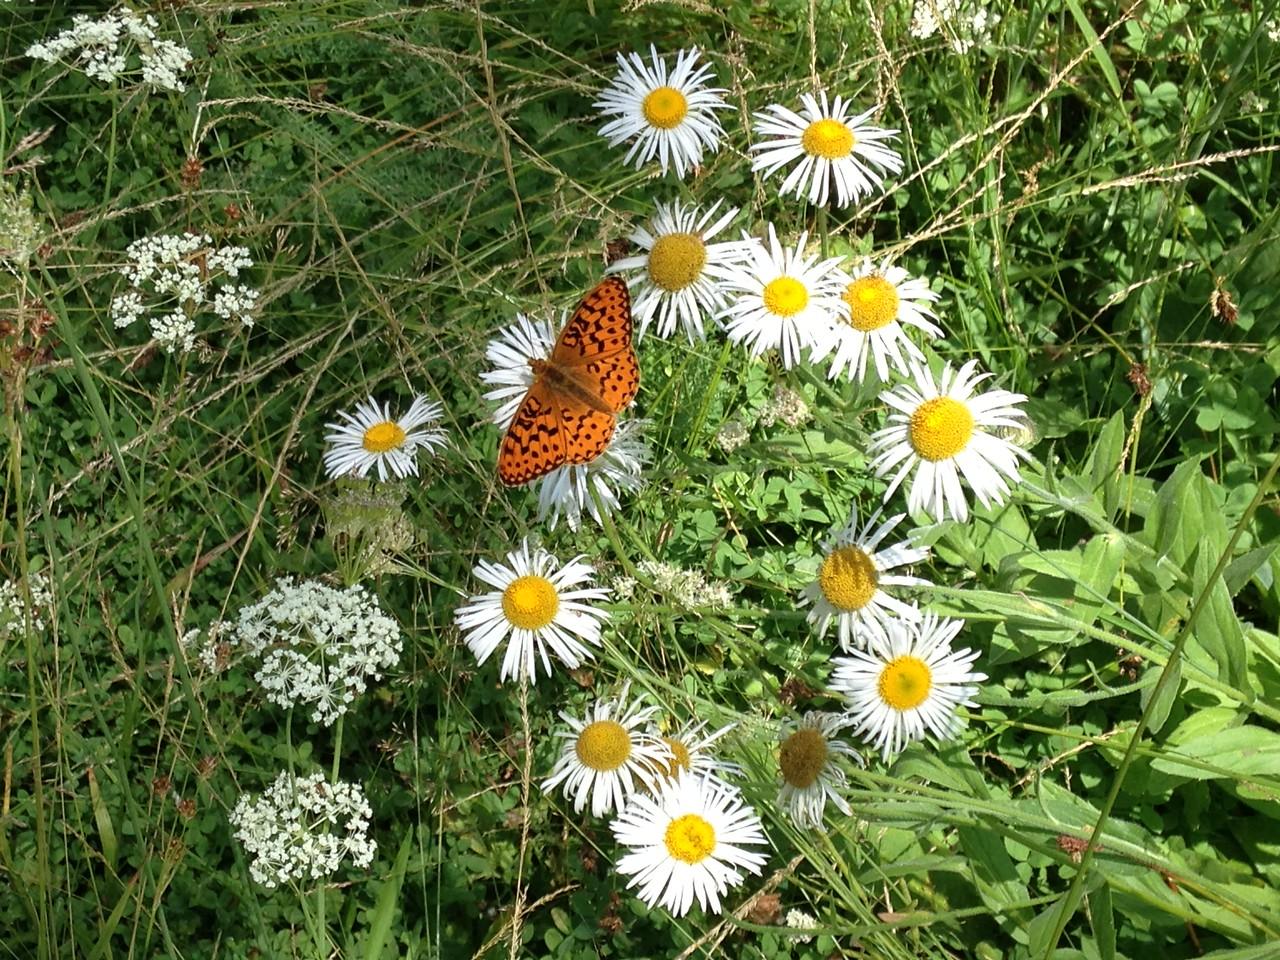 The butterfly is a Mountain Fritillary (Speyeria egleis.)